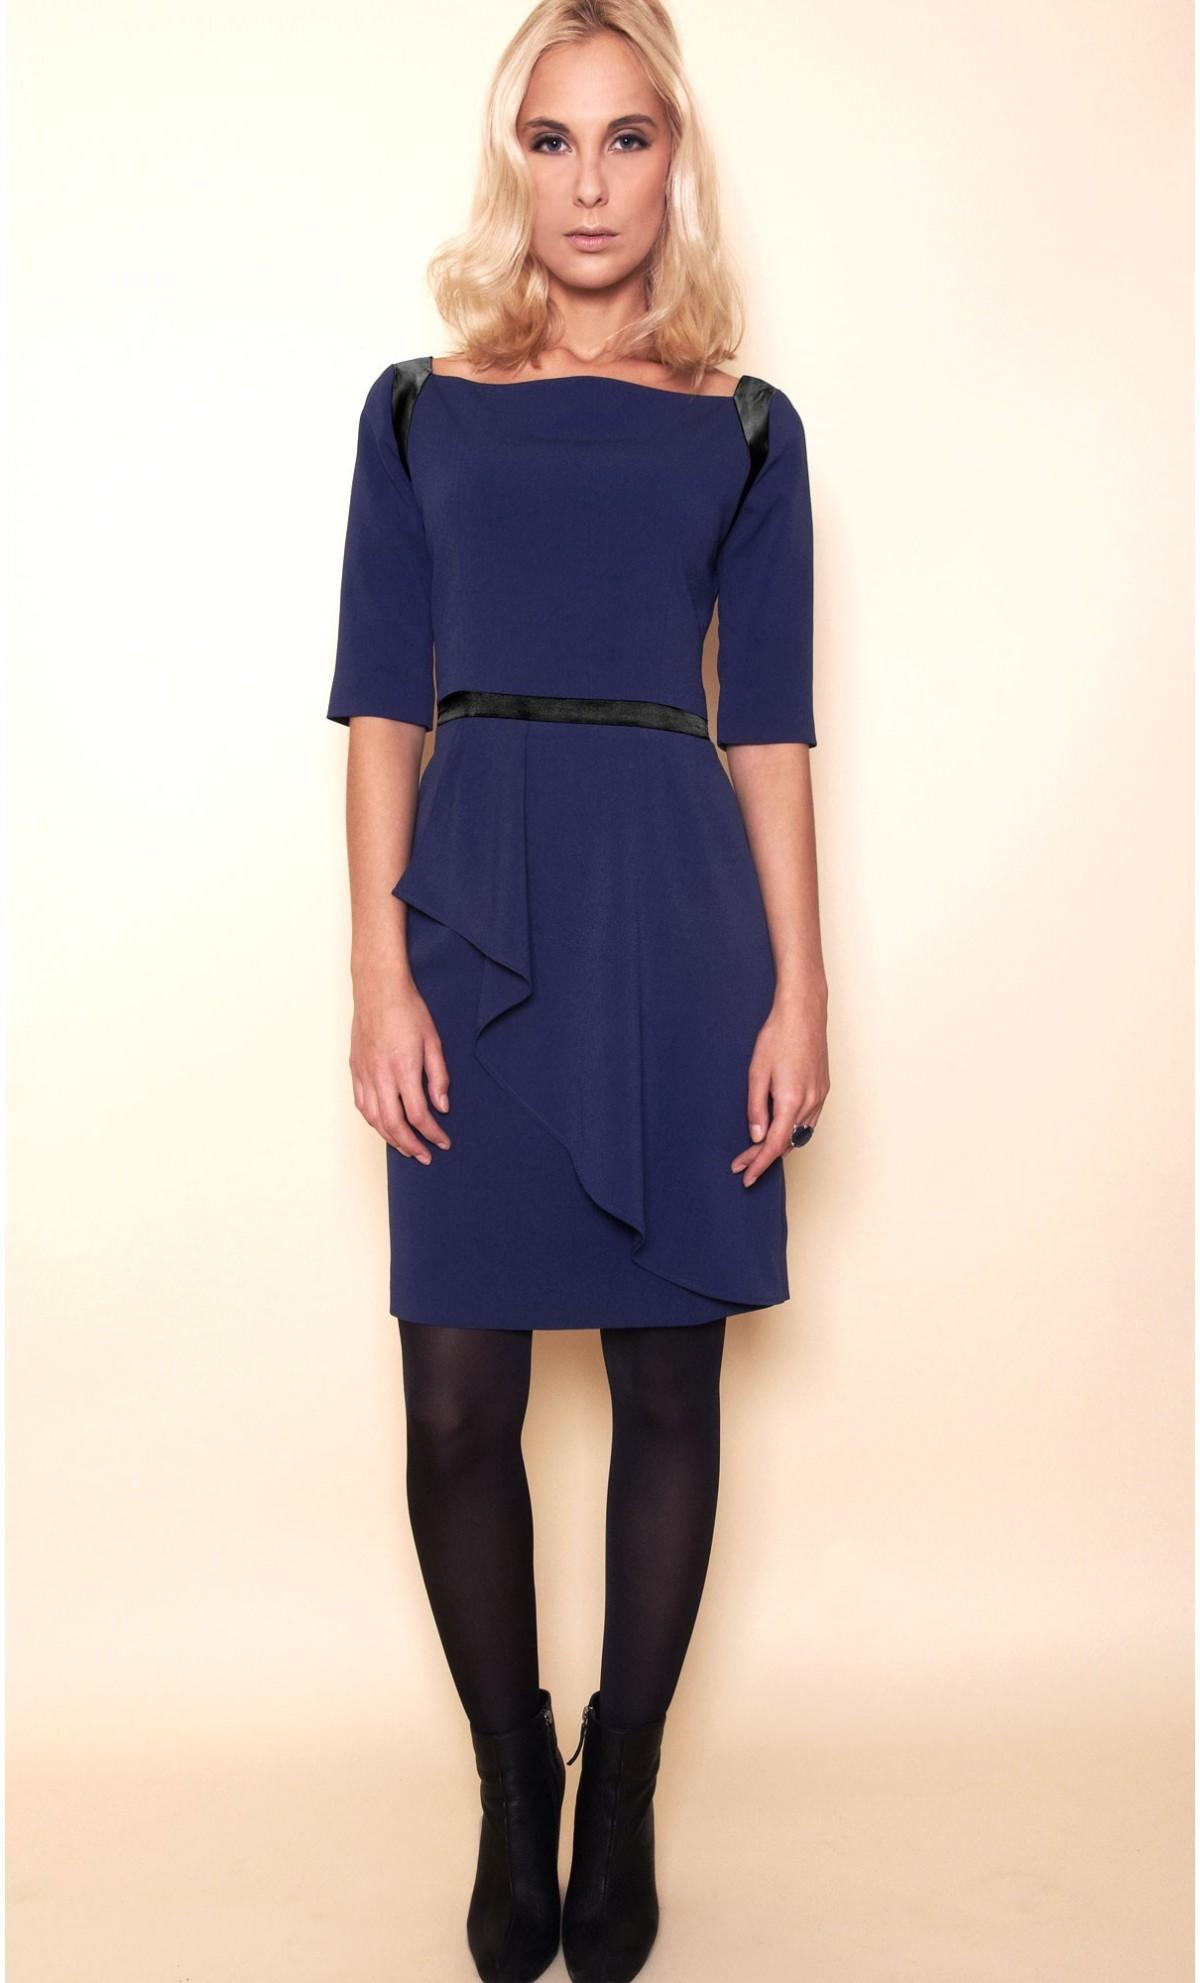 Comment accessoiriser une robe bleu marine